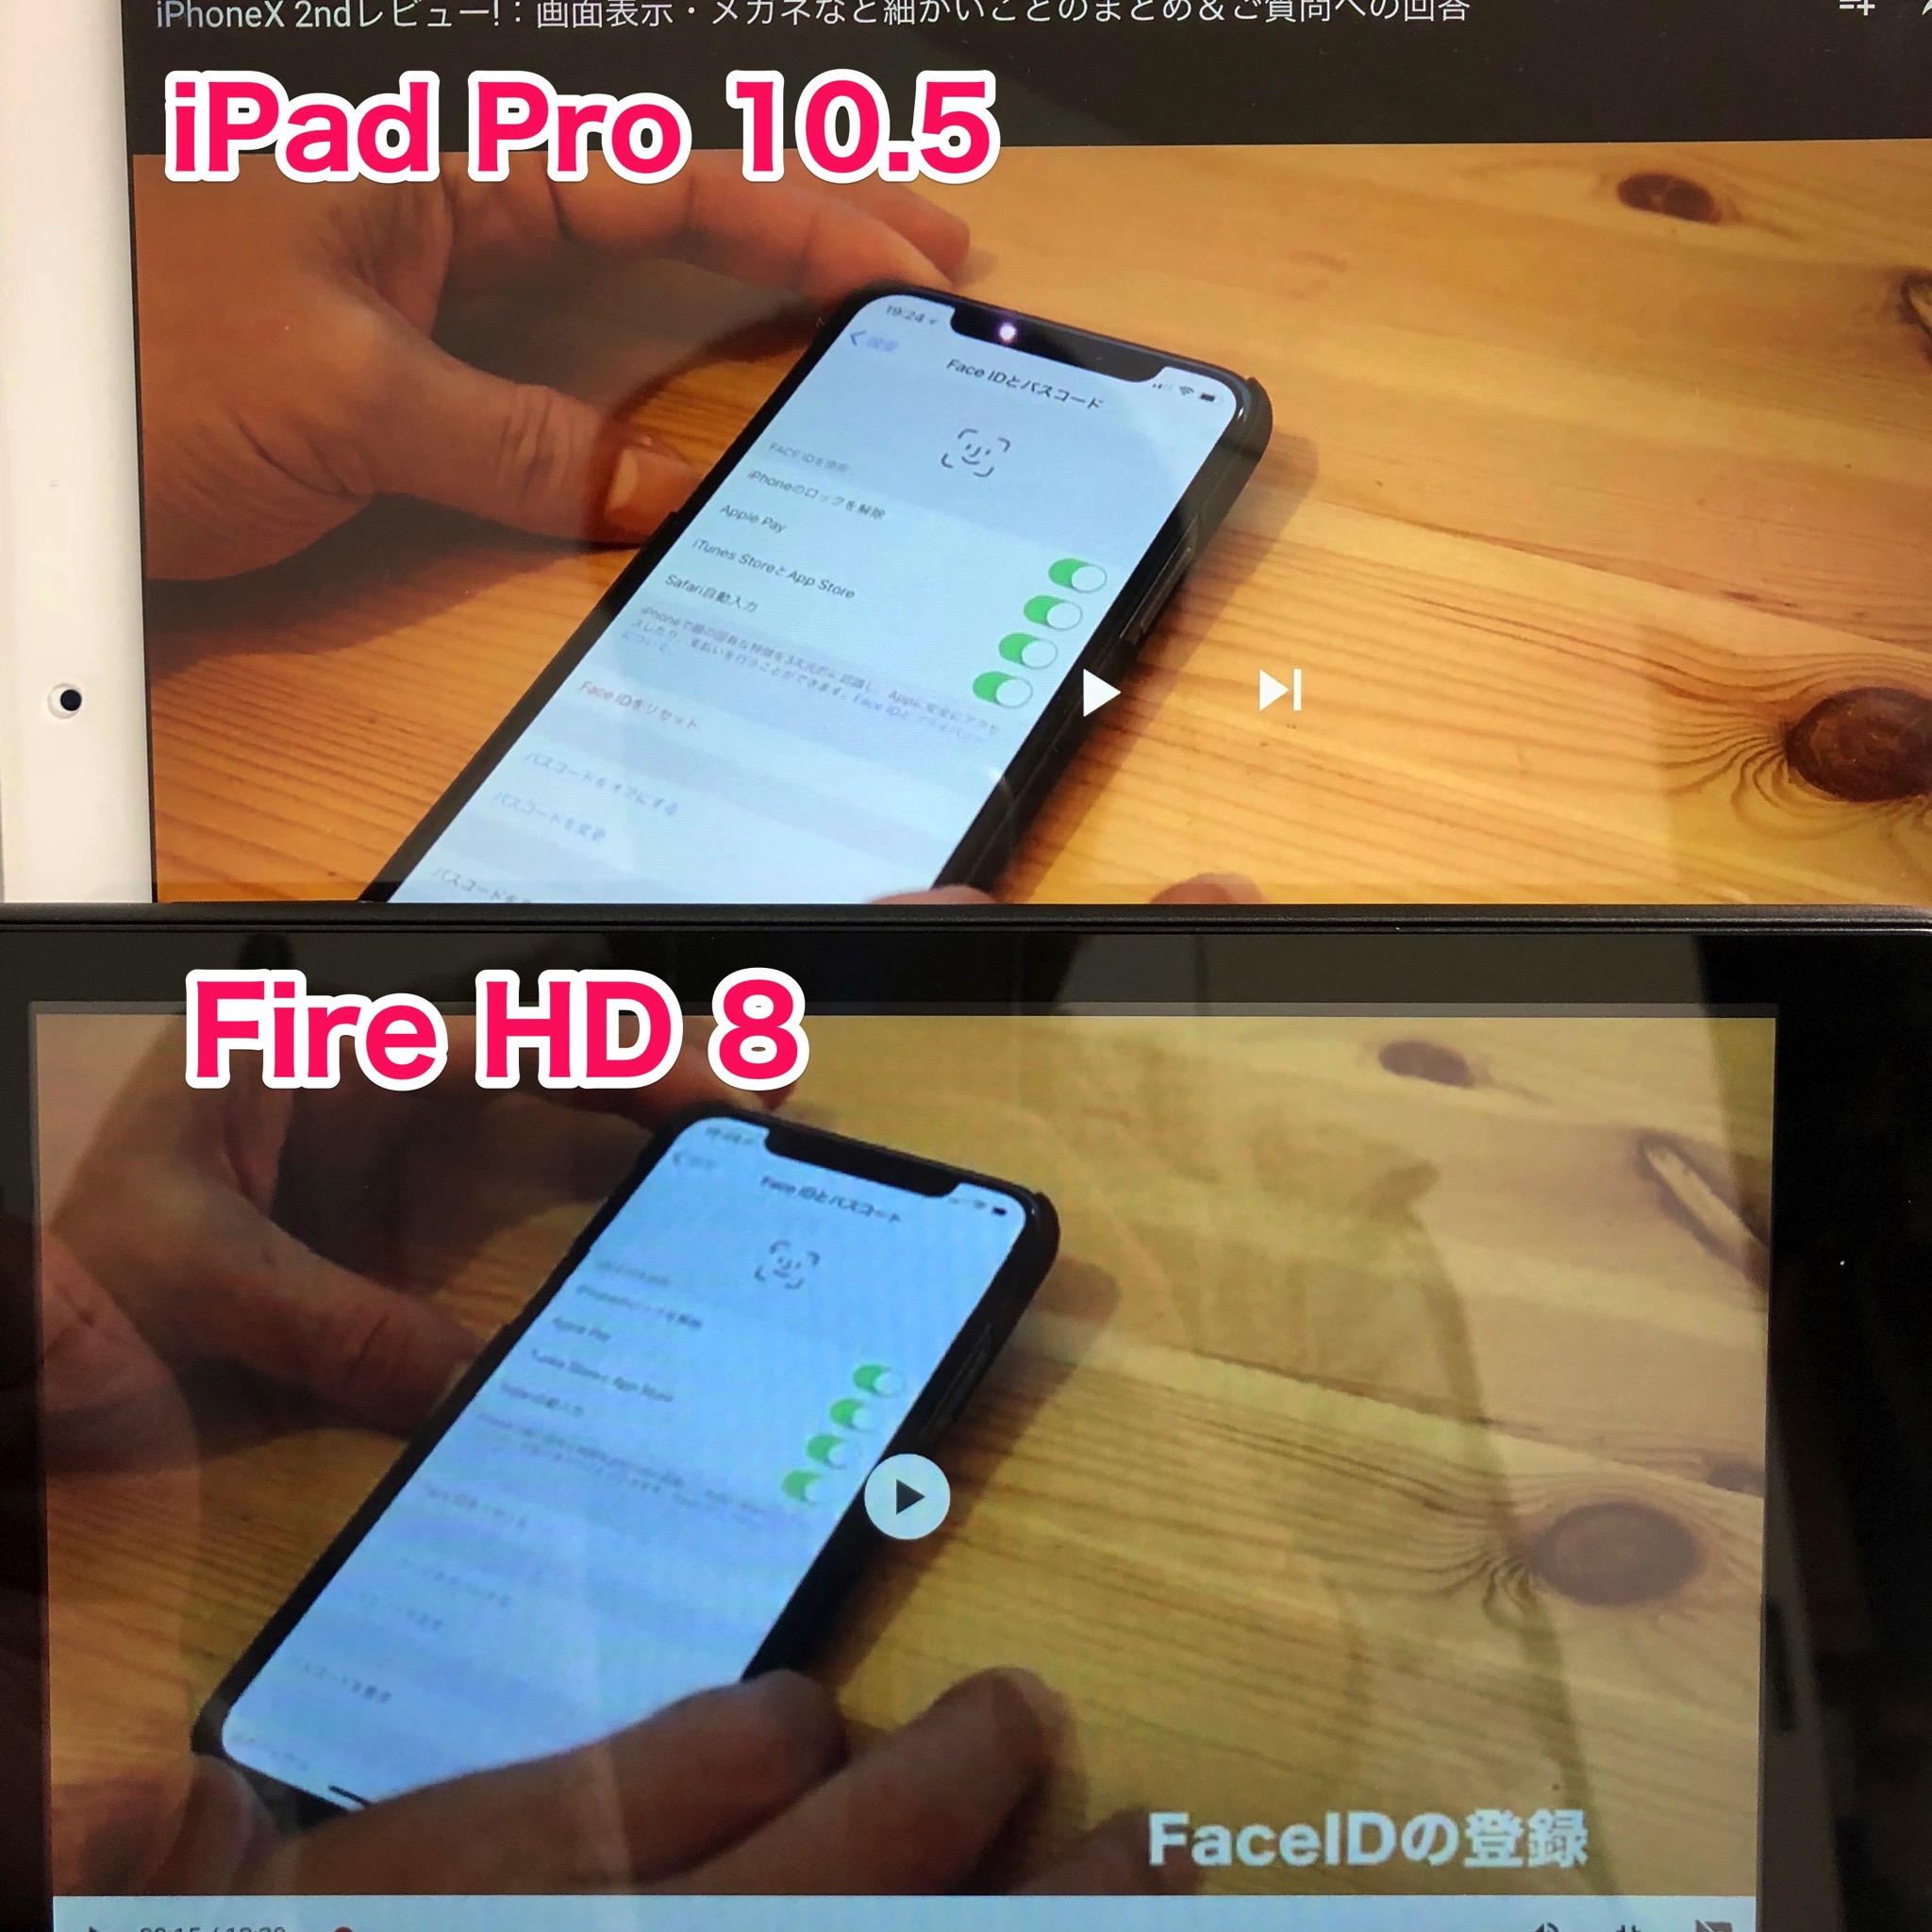 Fire HDとiPadの映像を比較